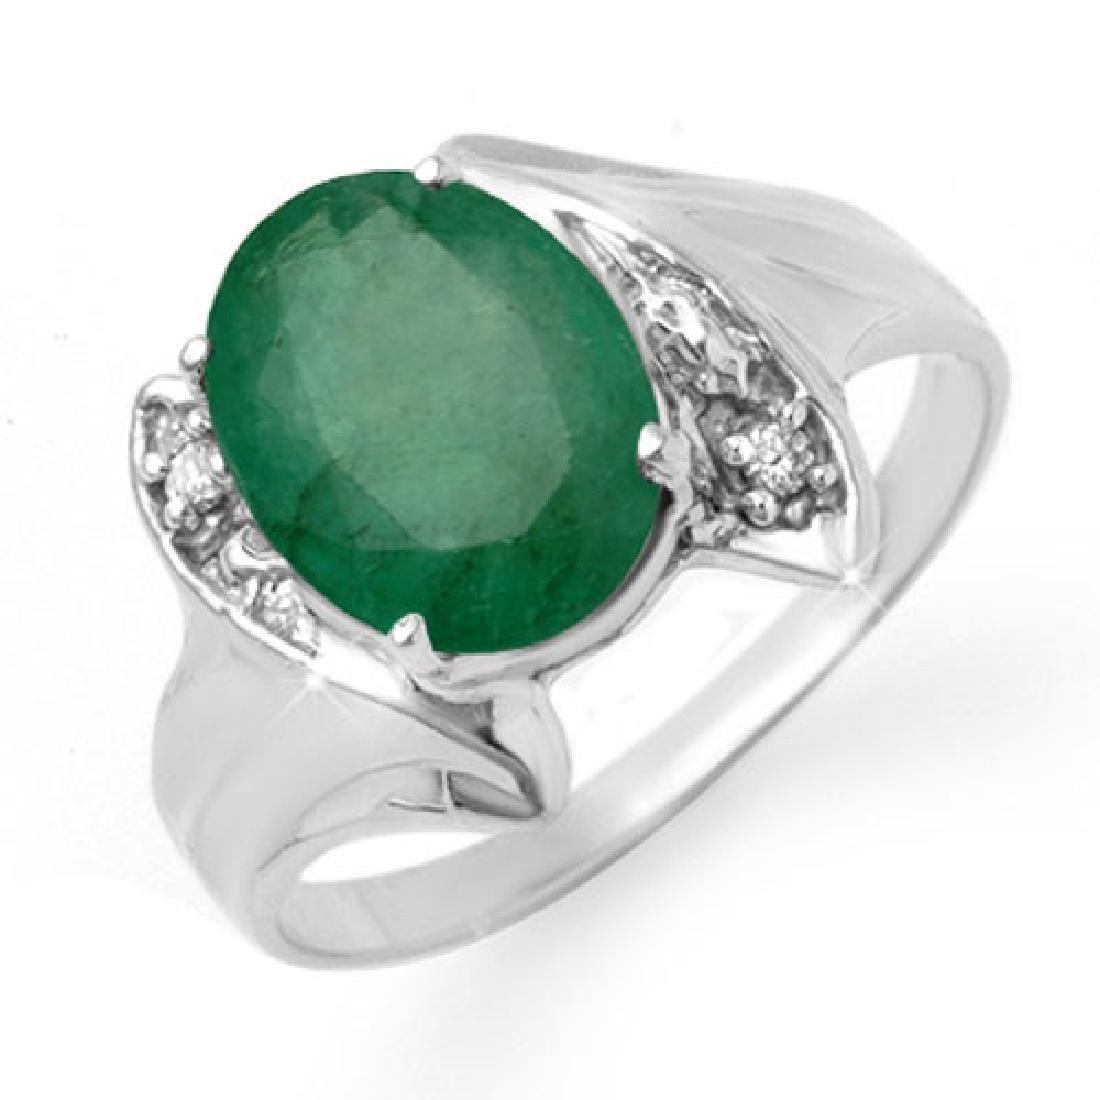 2.32 CTW Emerald & Diamond Ring 18K White Gold